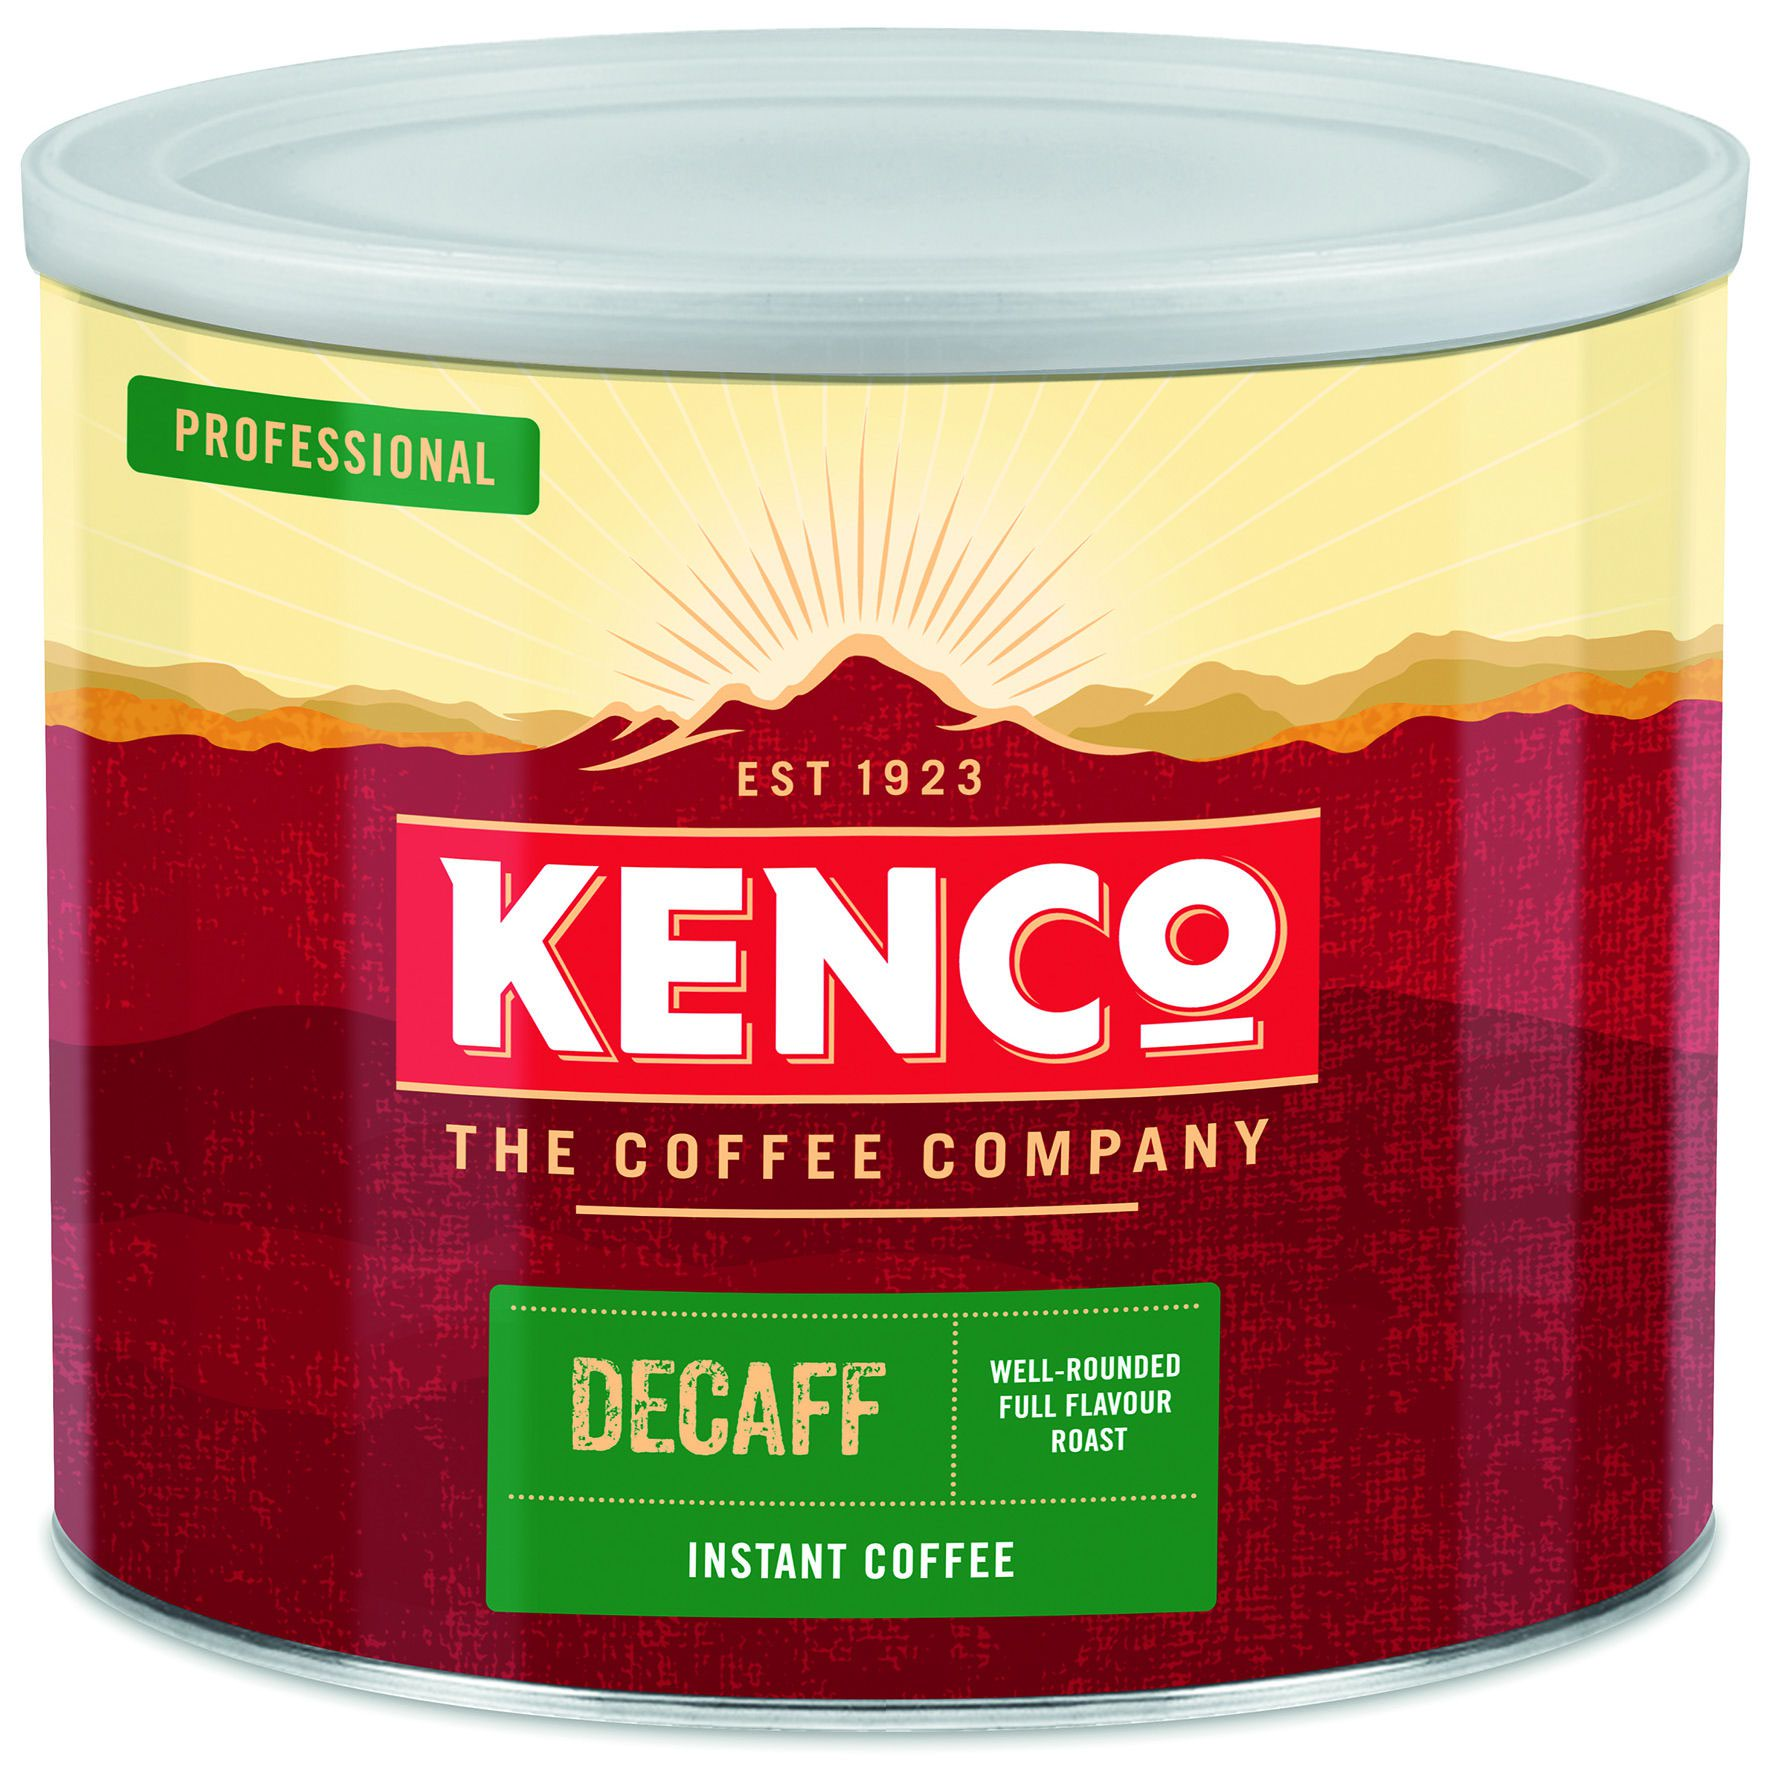 Kenco Decaff Coffee Tin 500g